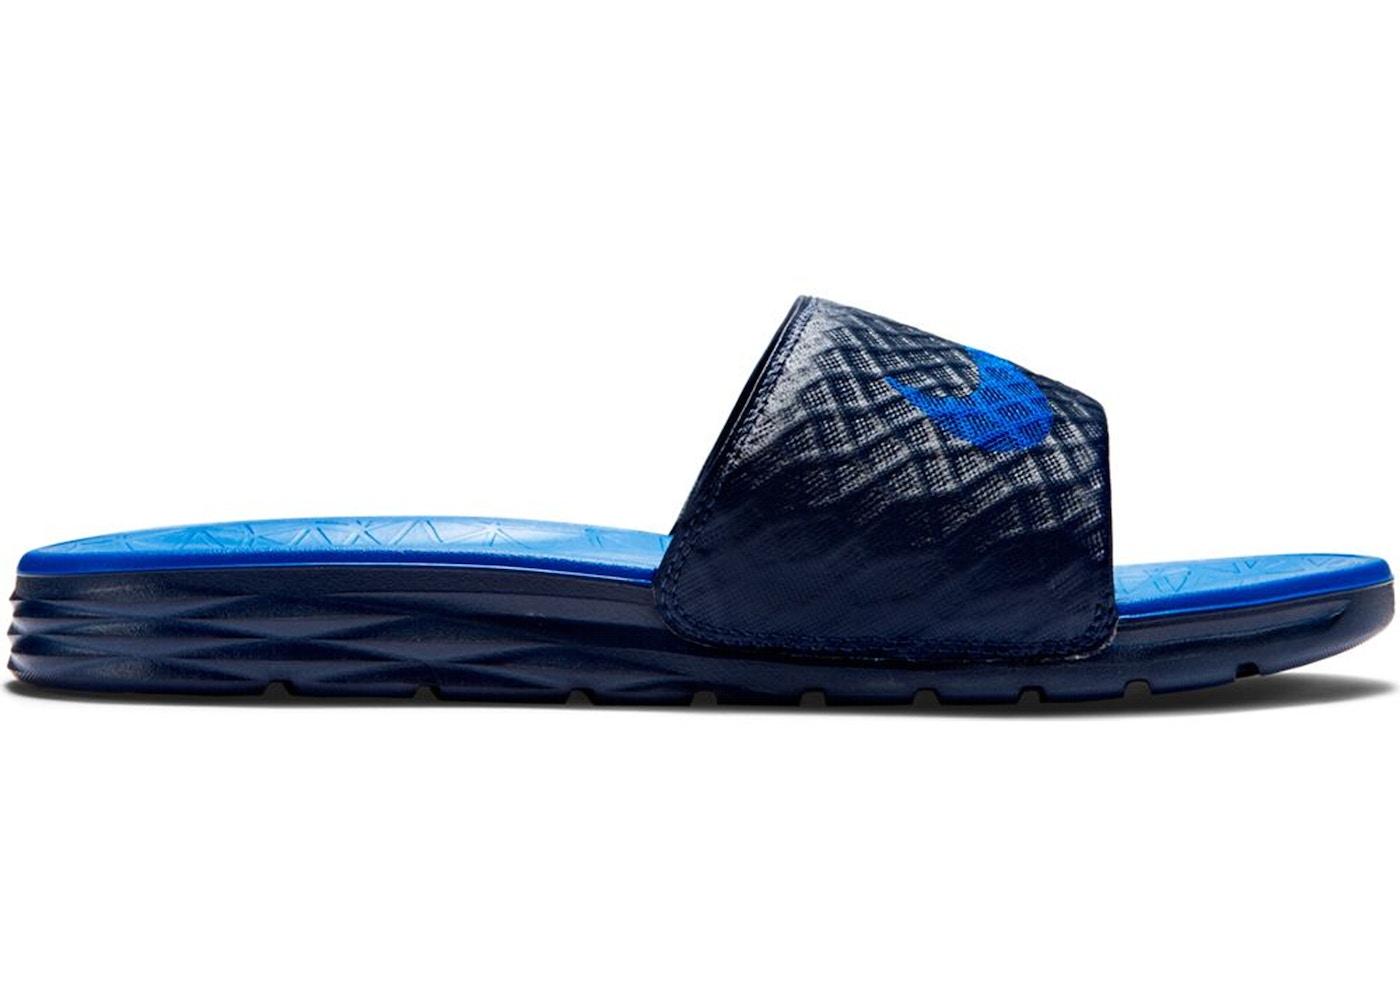 sports shoes 028b8 59a6e Nike Benassi Solarsoft 2 Midnight Navy Lyon Blue